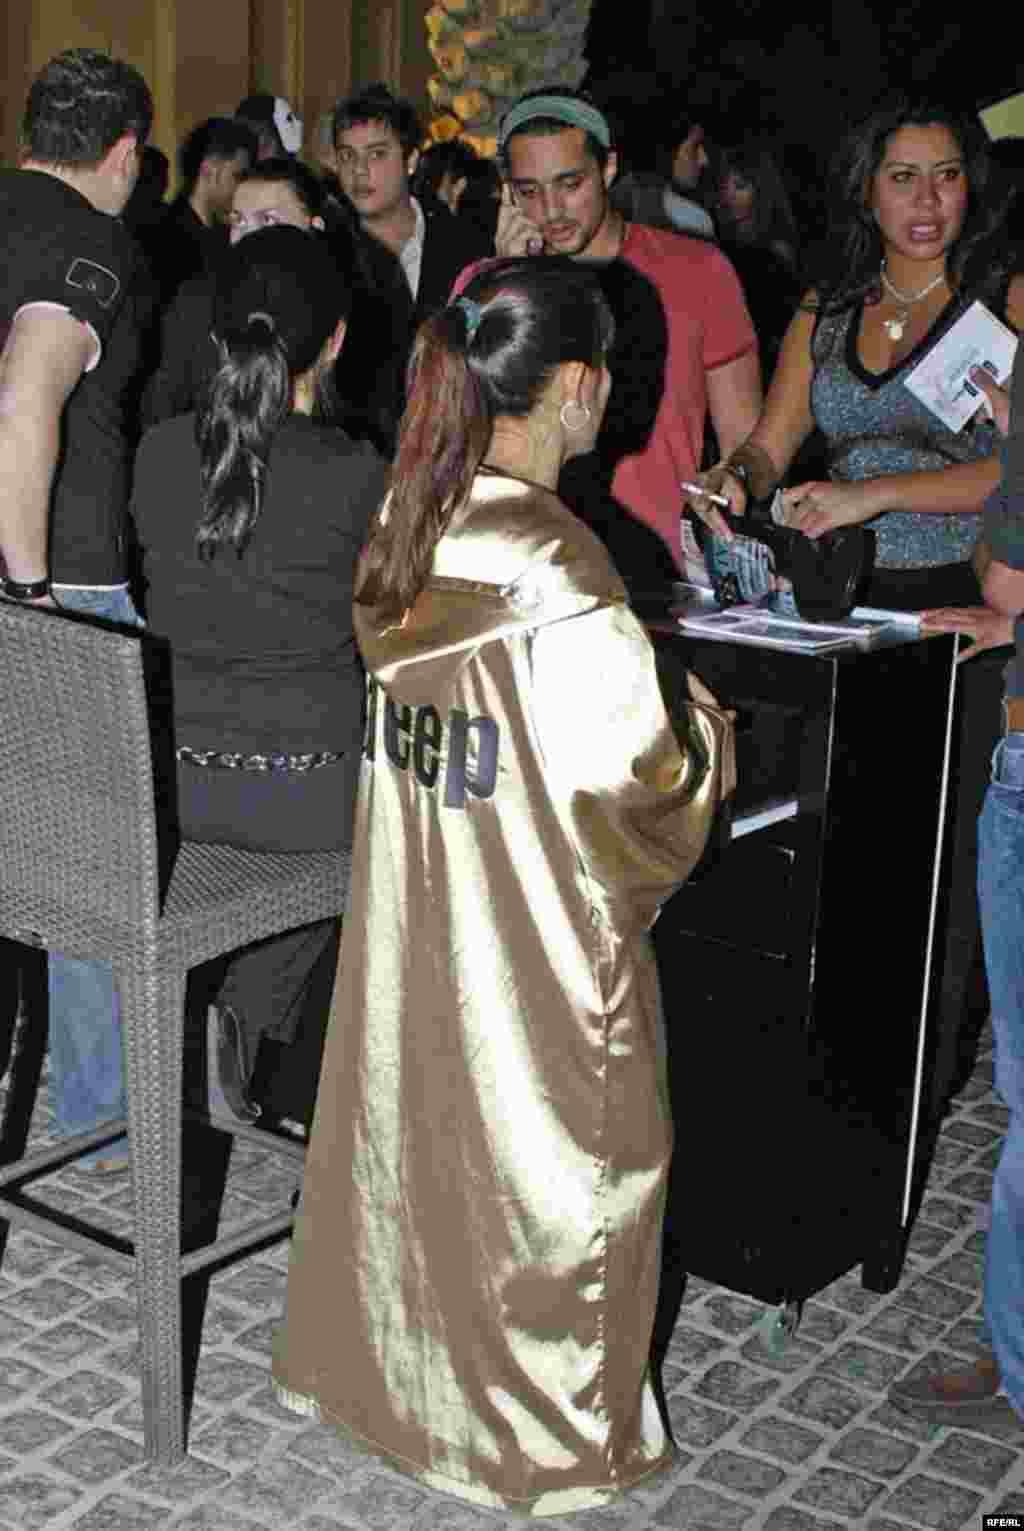 UAE, Deep Dish Concert at Club trilogy in Dubai, 04/15/2007